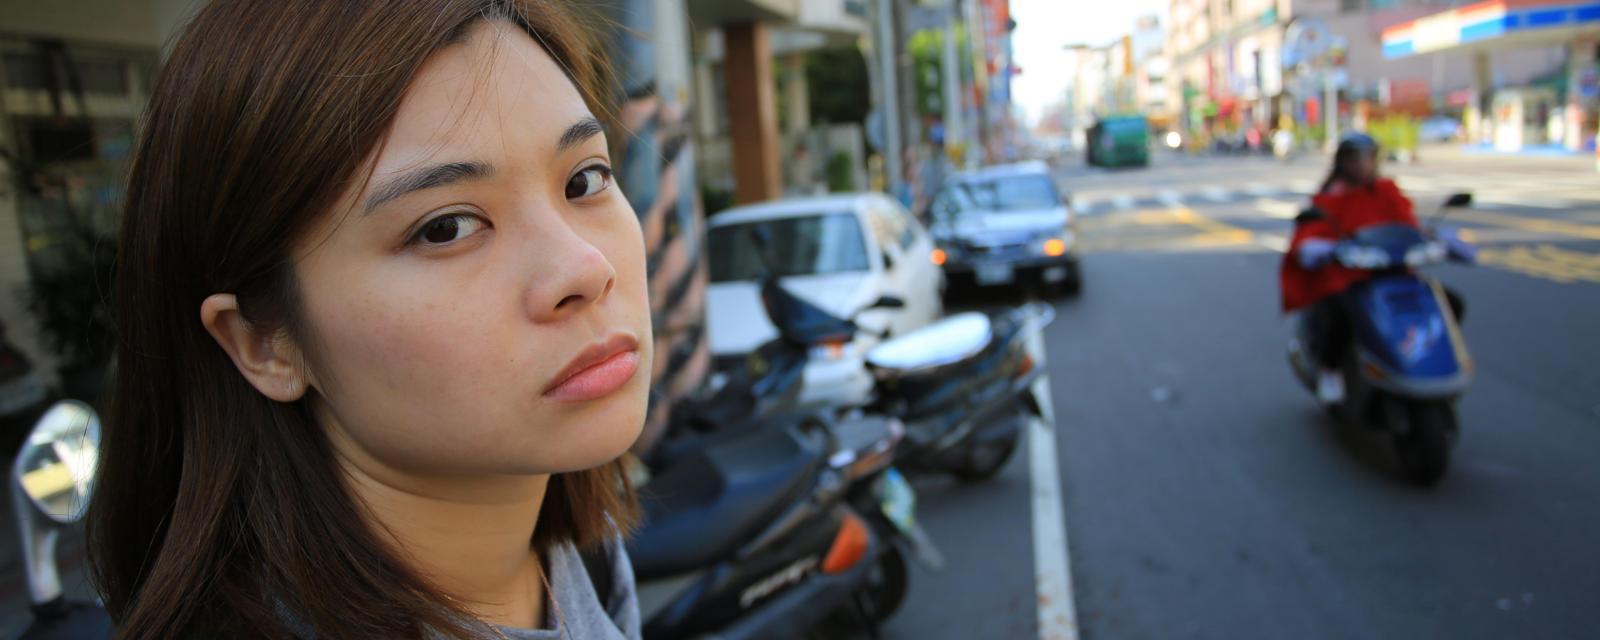 a girl posing near a street